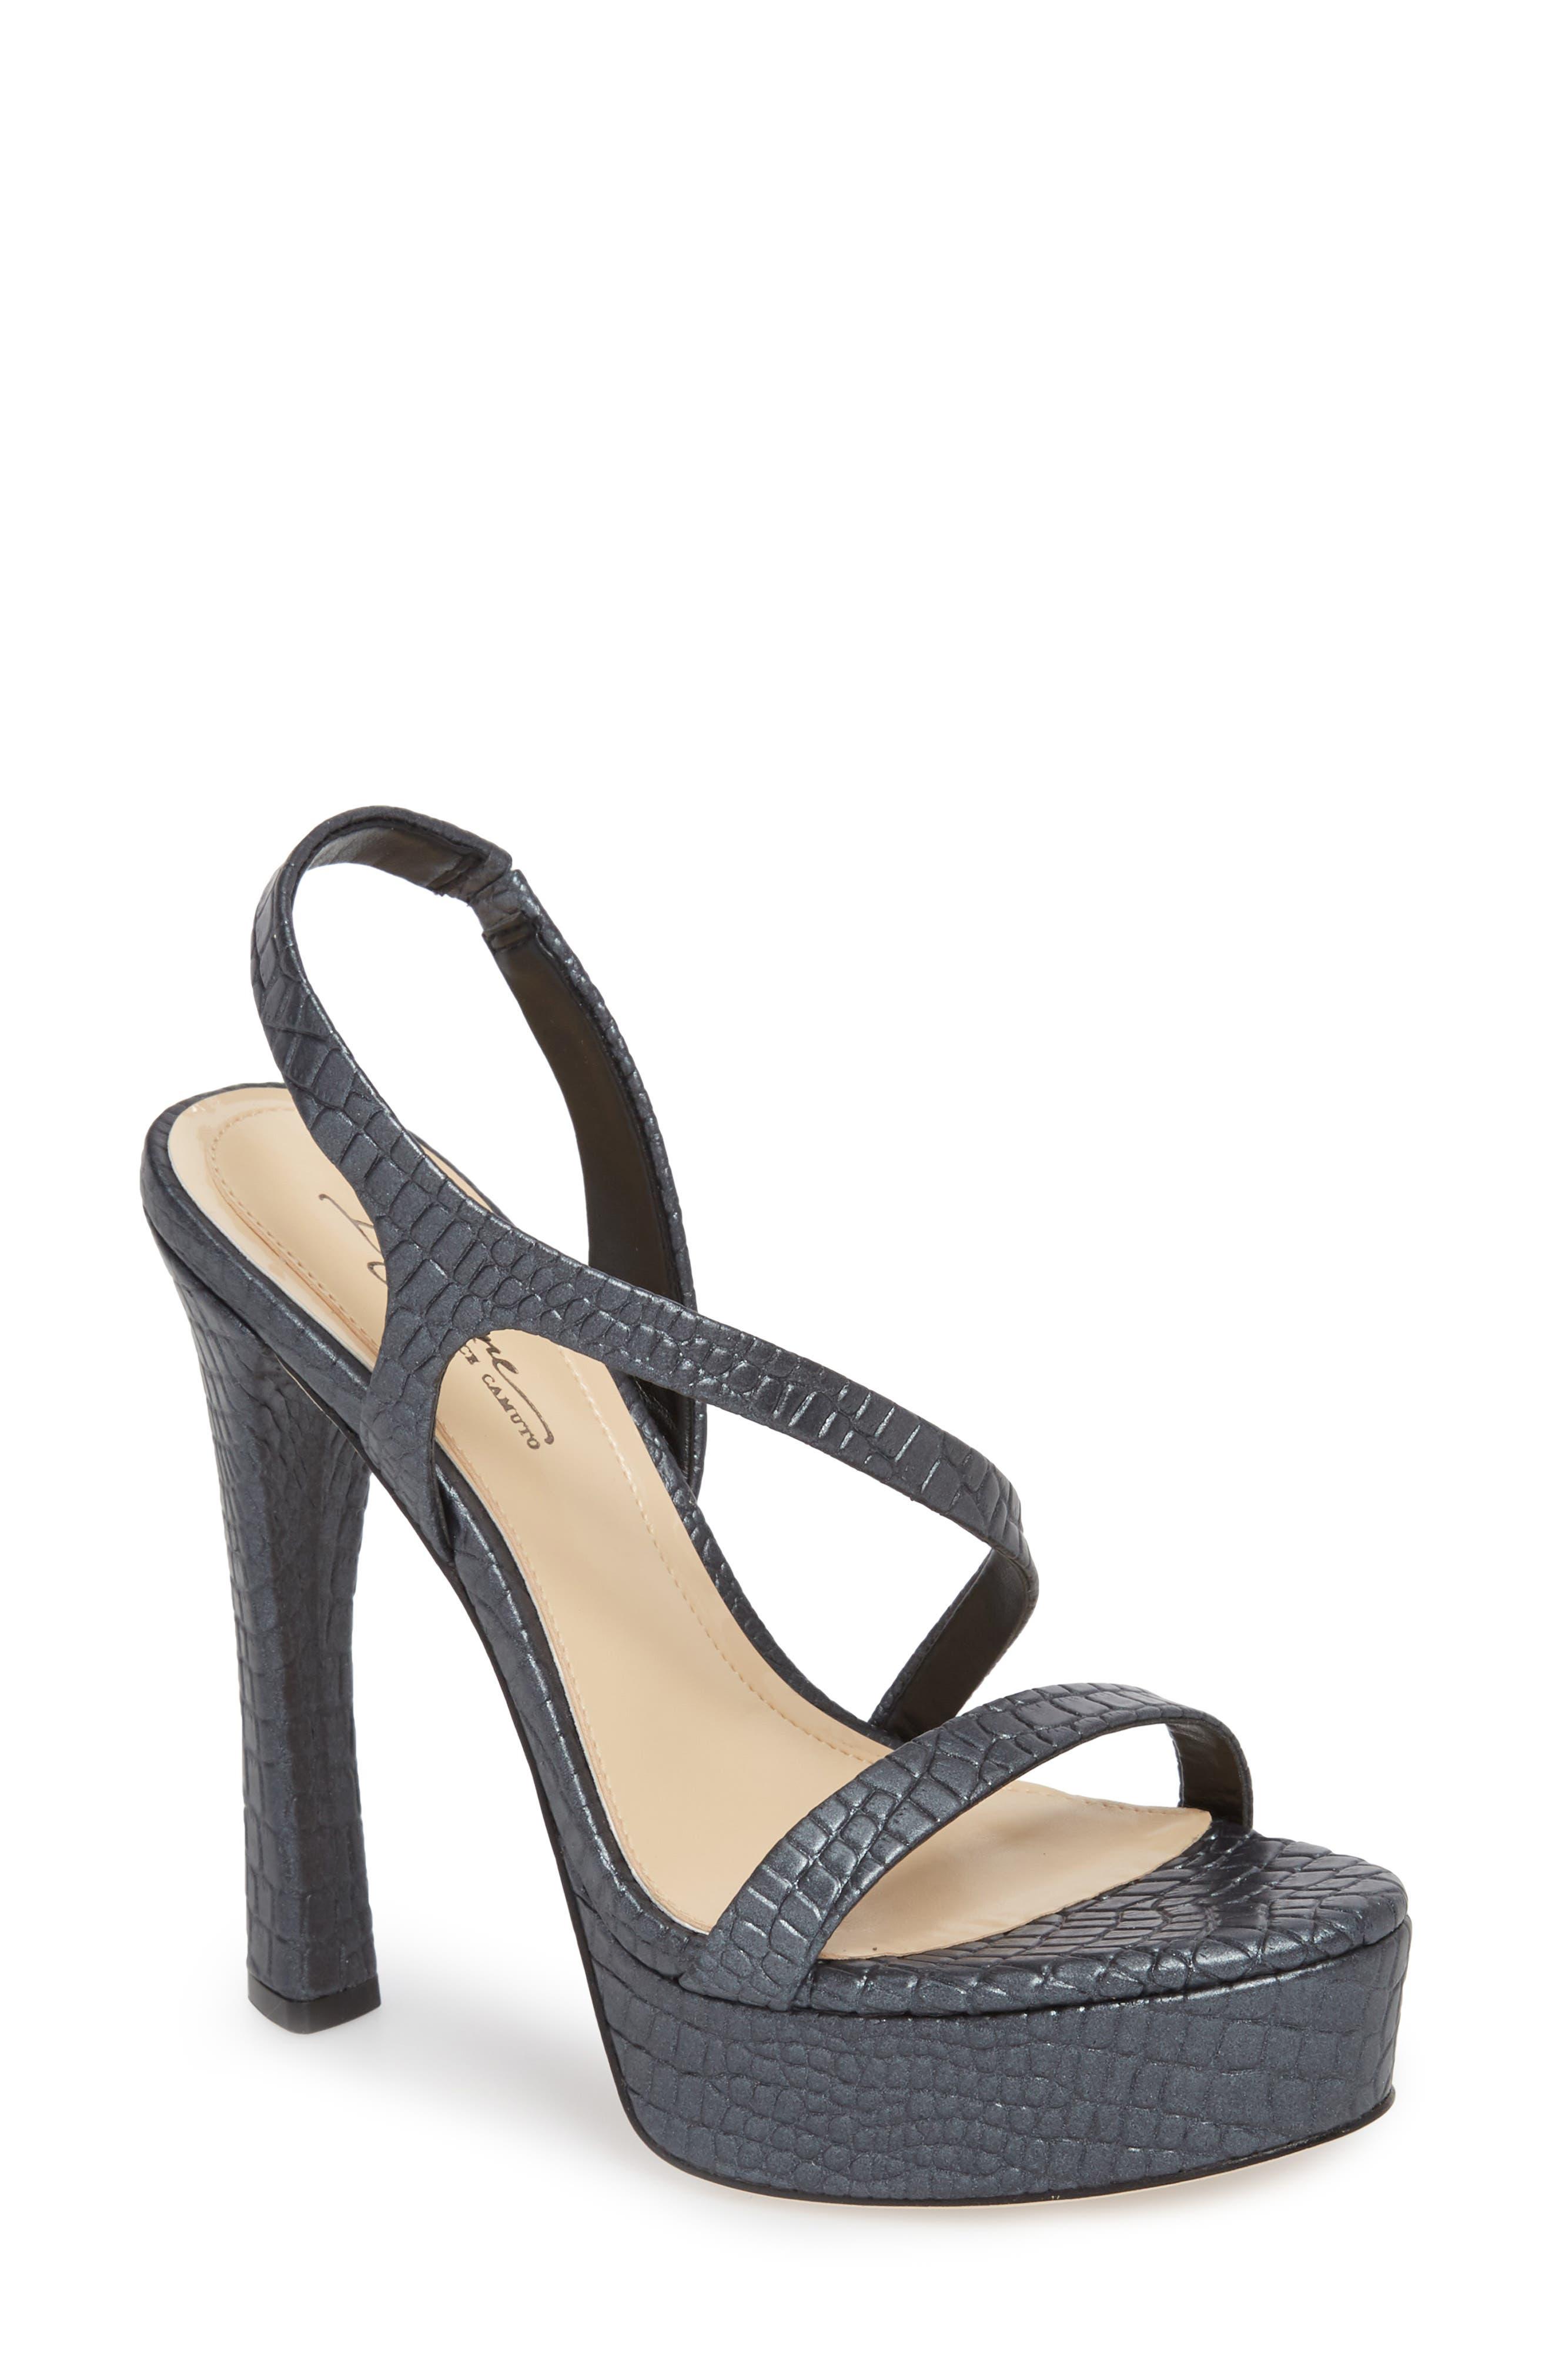 Imagine By Vince Camuto Piera Platform Sandal, Black